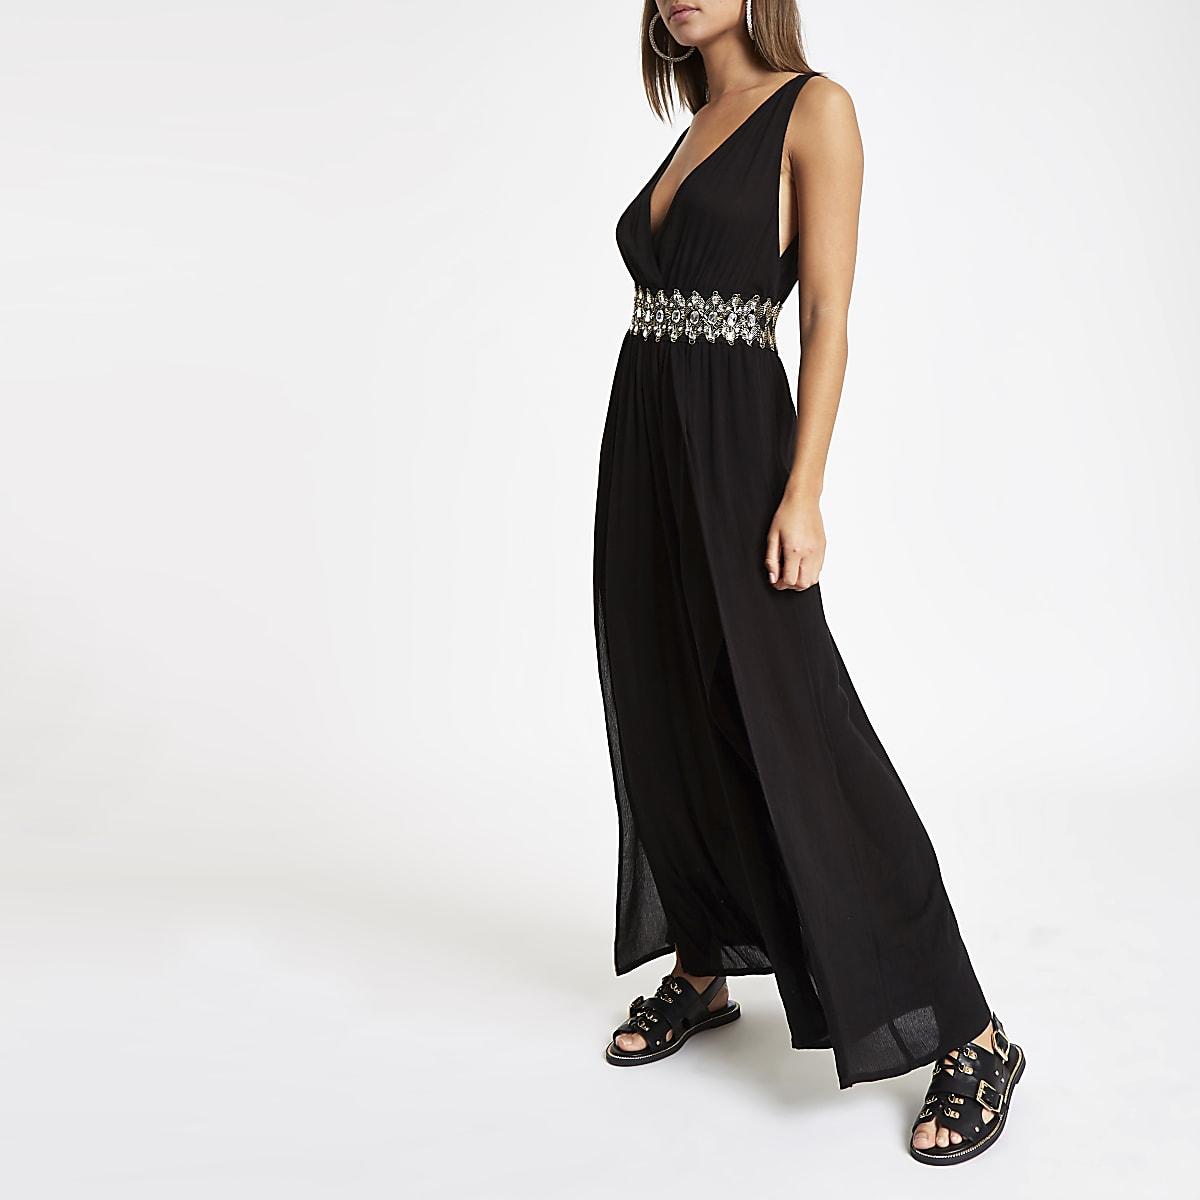 fce6ce9e94d7f Black plunge diamante waist beach jumpsuit - Kaftans & Beach Cover-Ups -  Swimwear & Beachwear - women